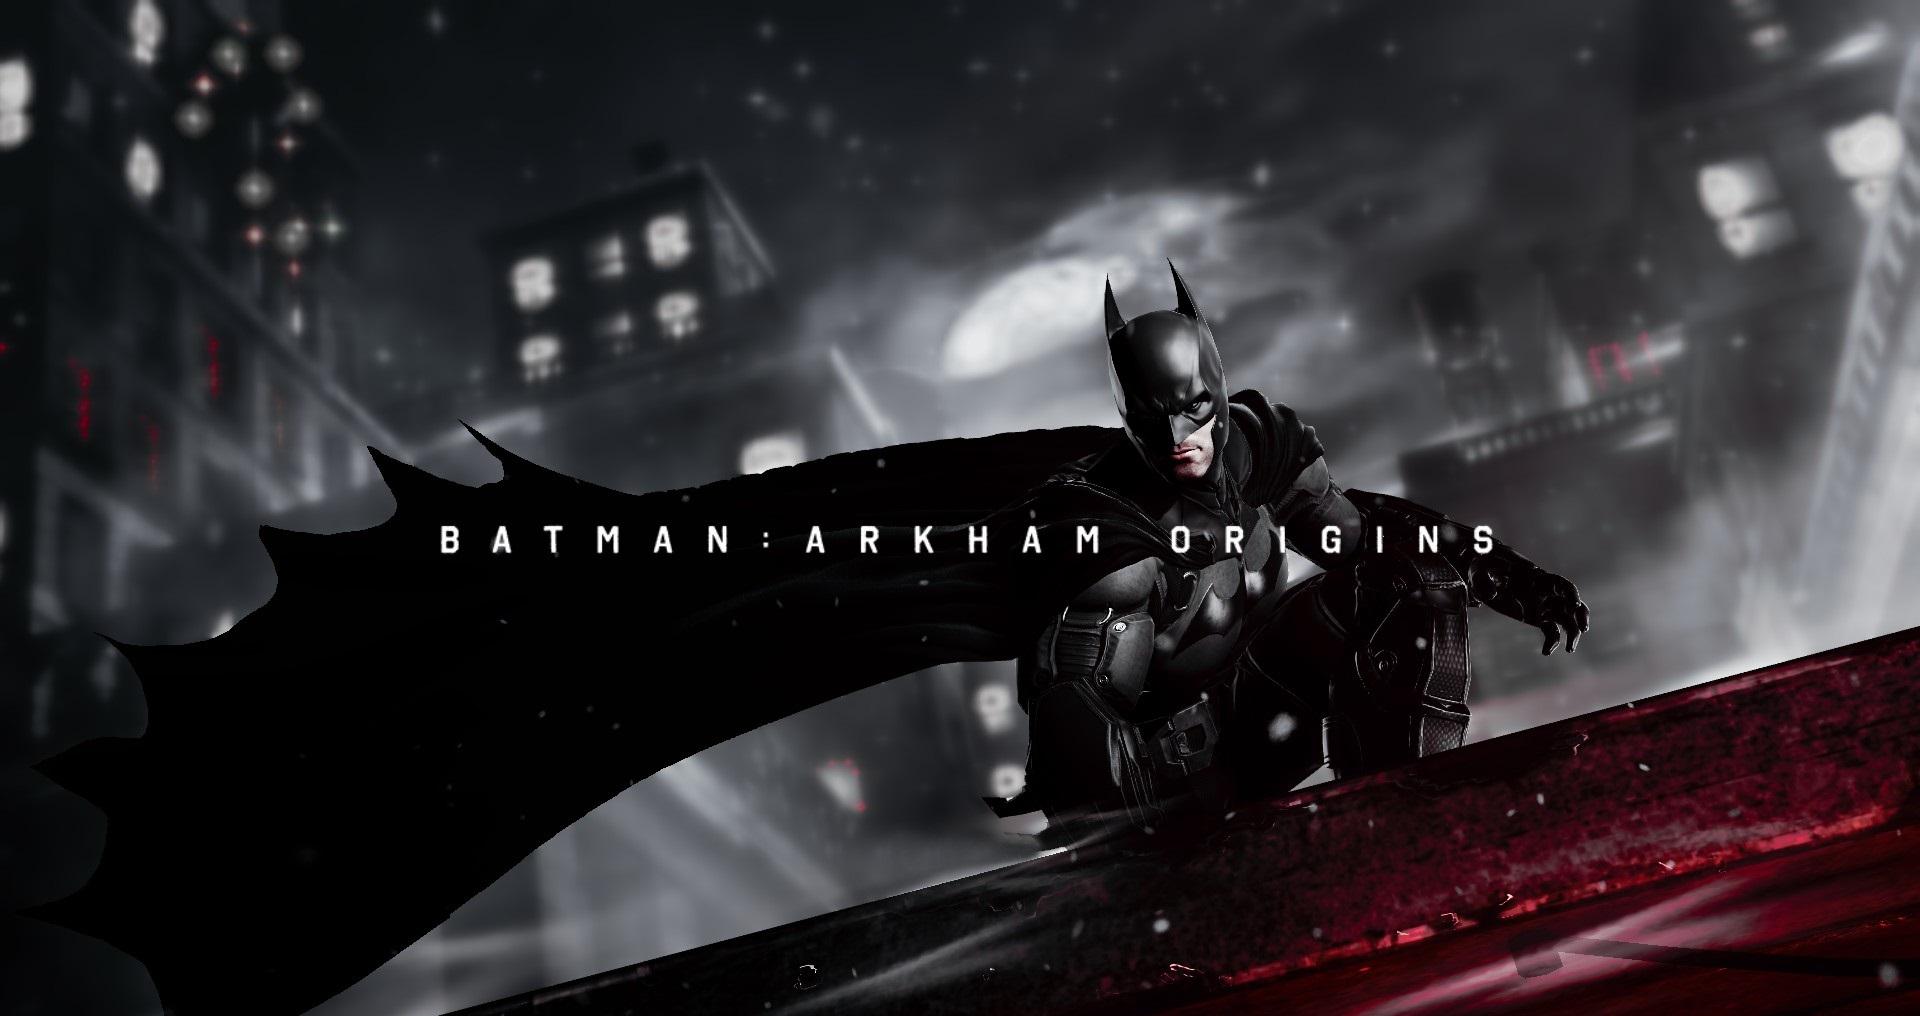 Batman-Origins-Start-Screen-Logo-1-Batman-Arkham-Origins-Wallpapers-1920x1080-WideWallpapersHD